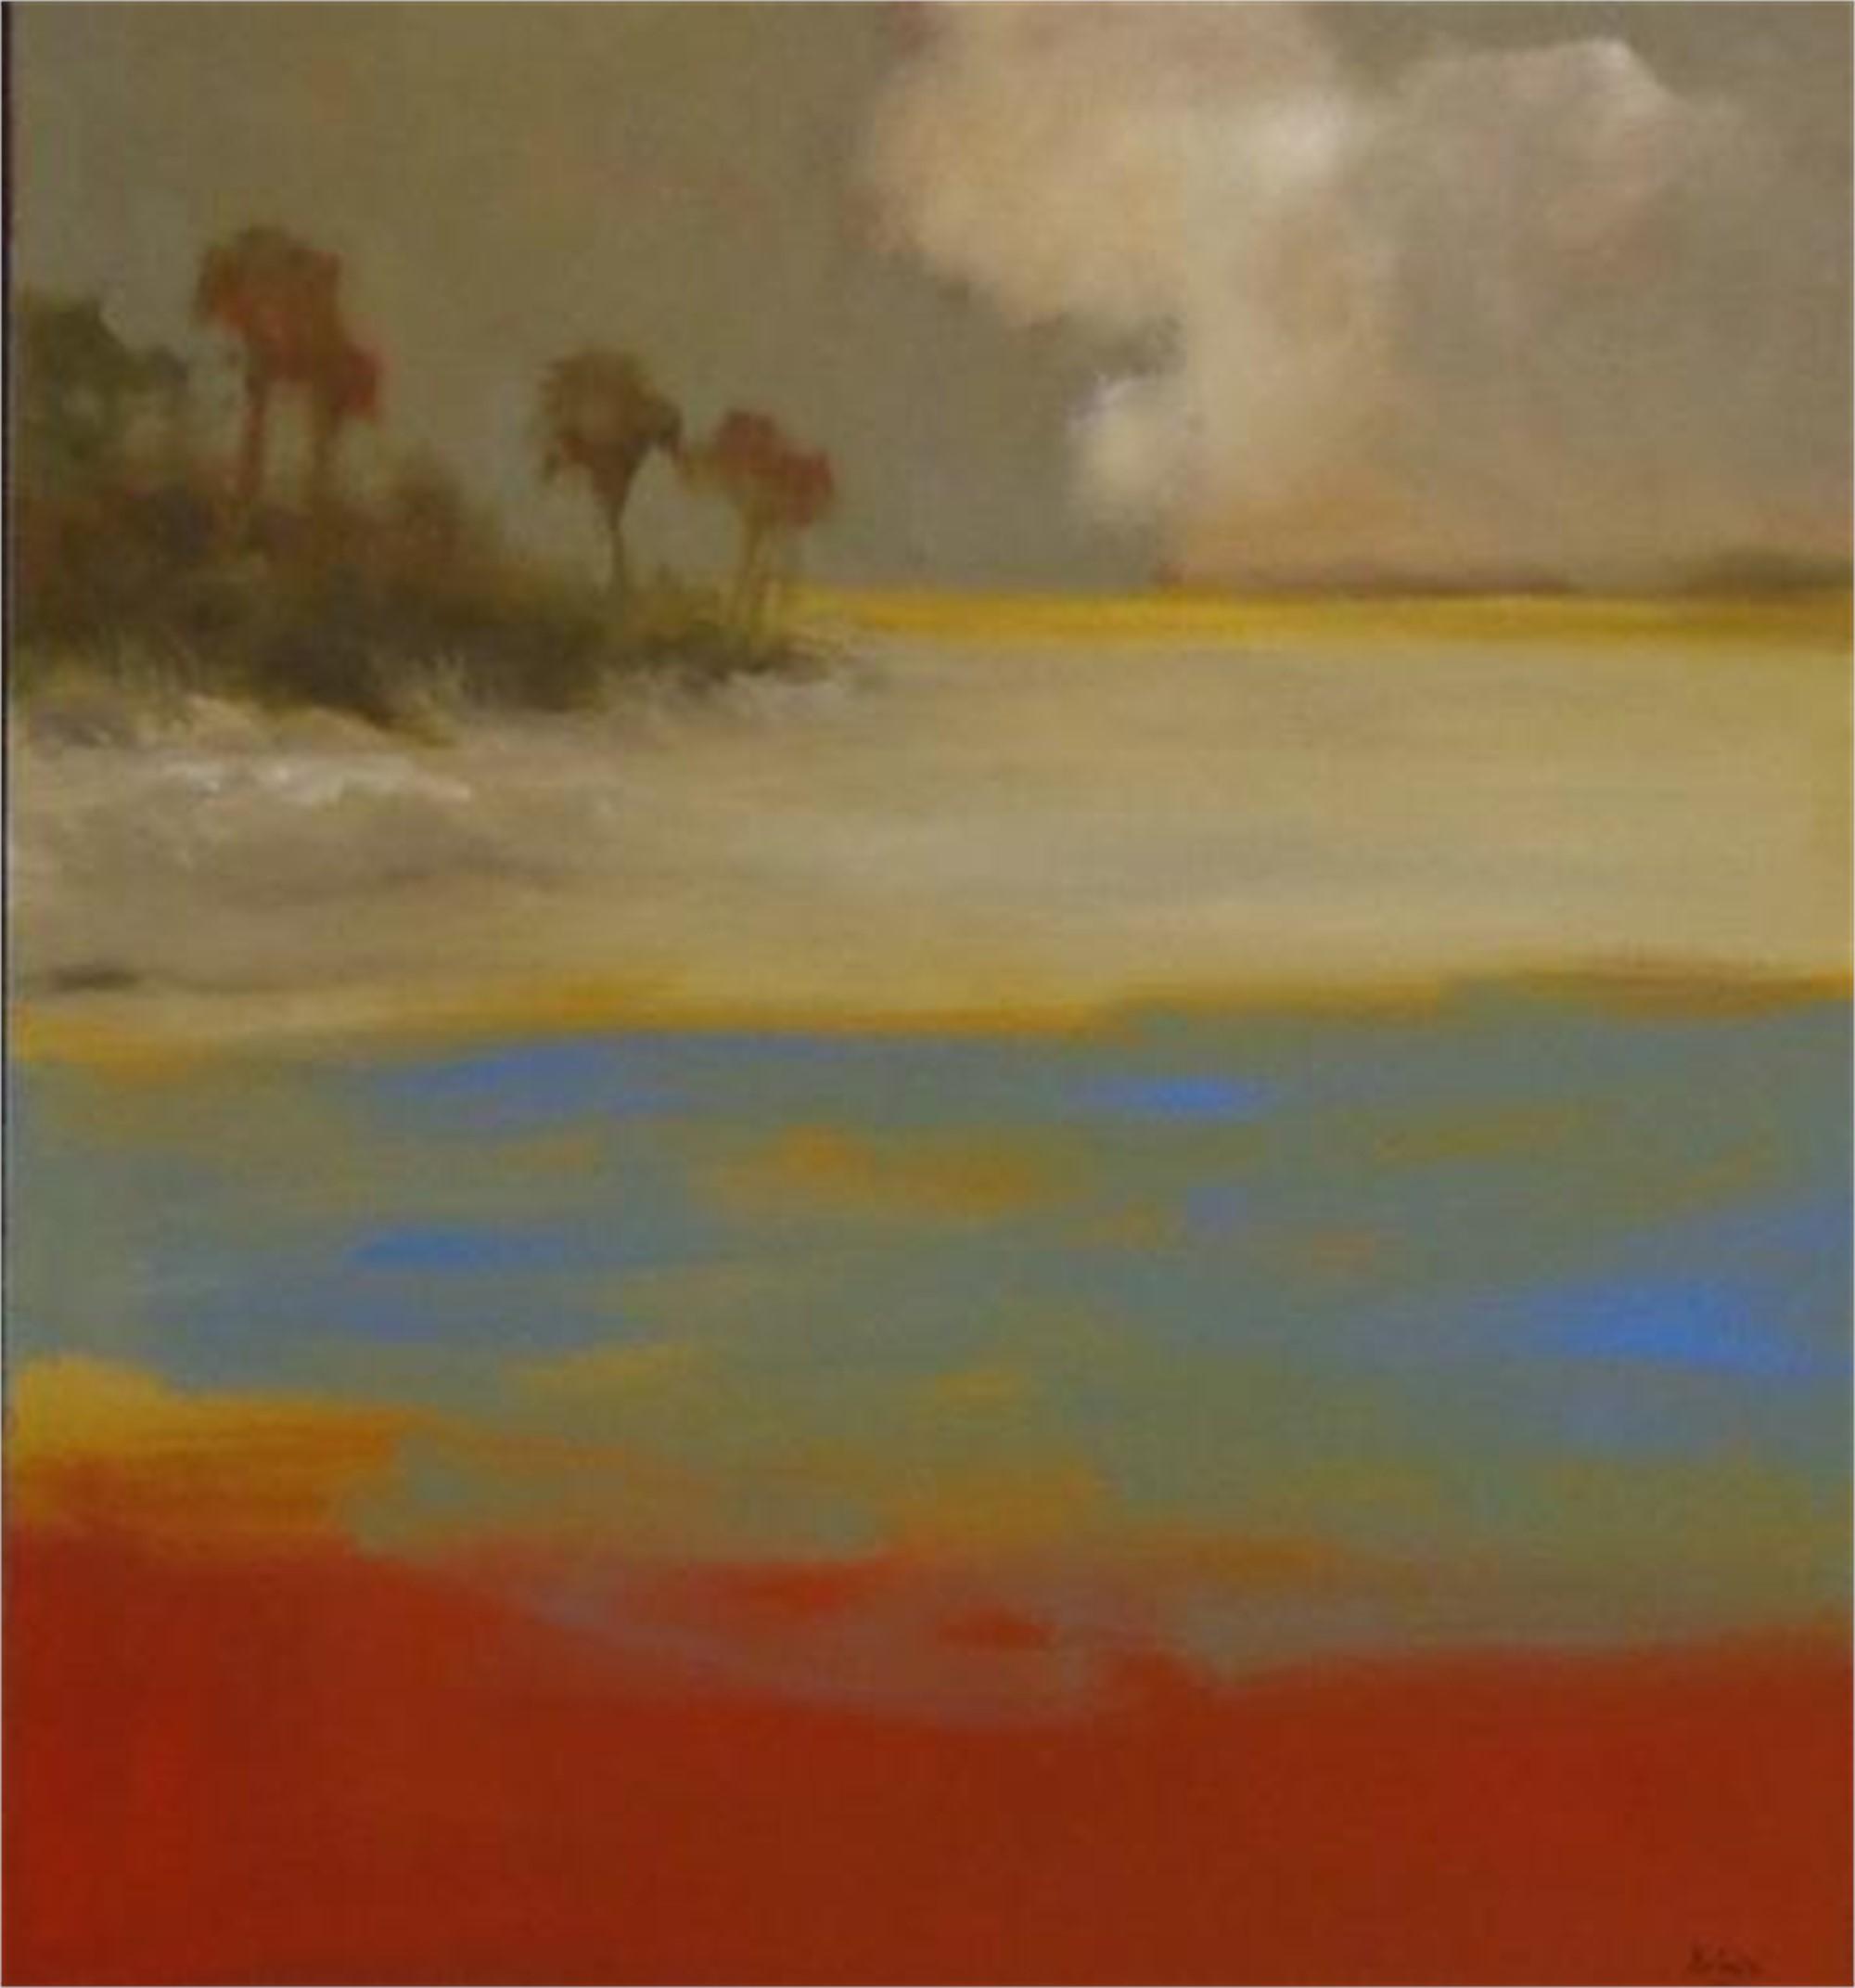 Barrier Island by Jim Darlington